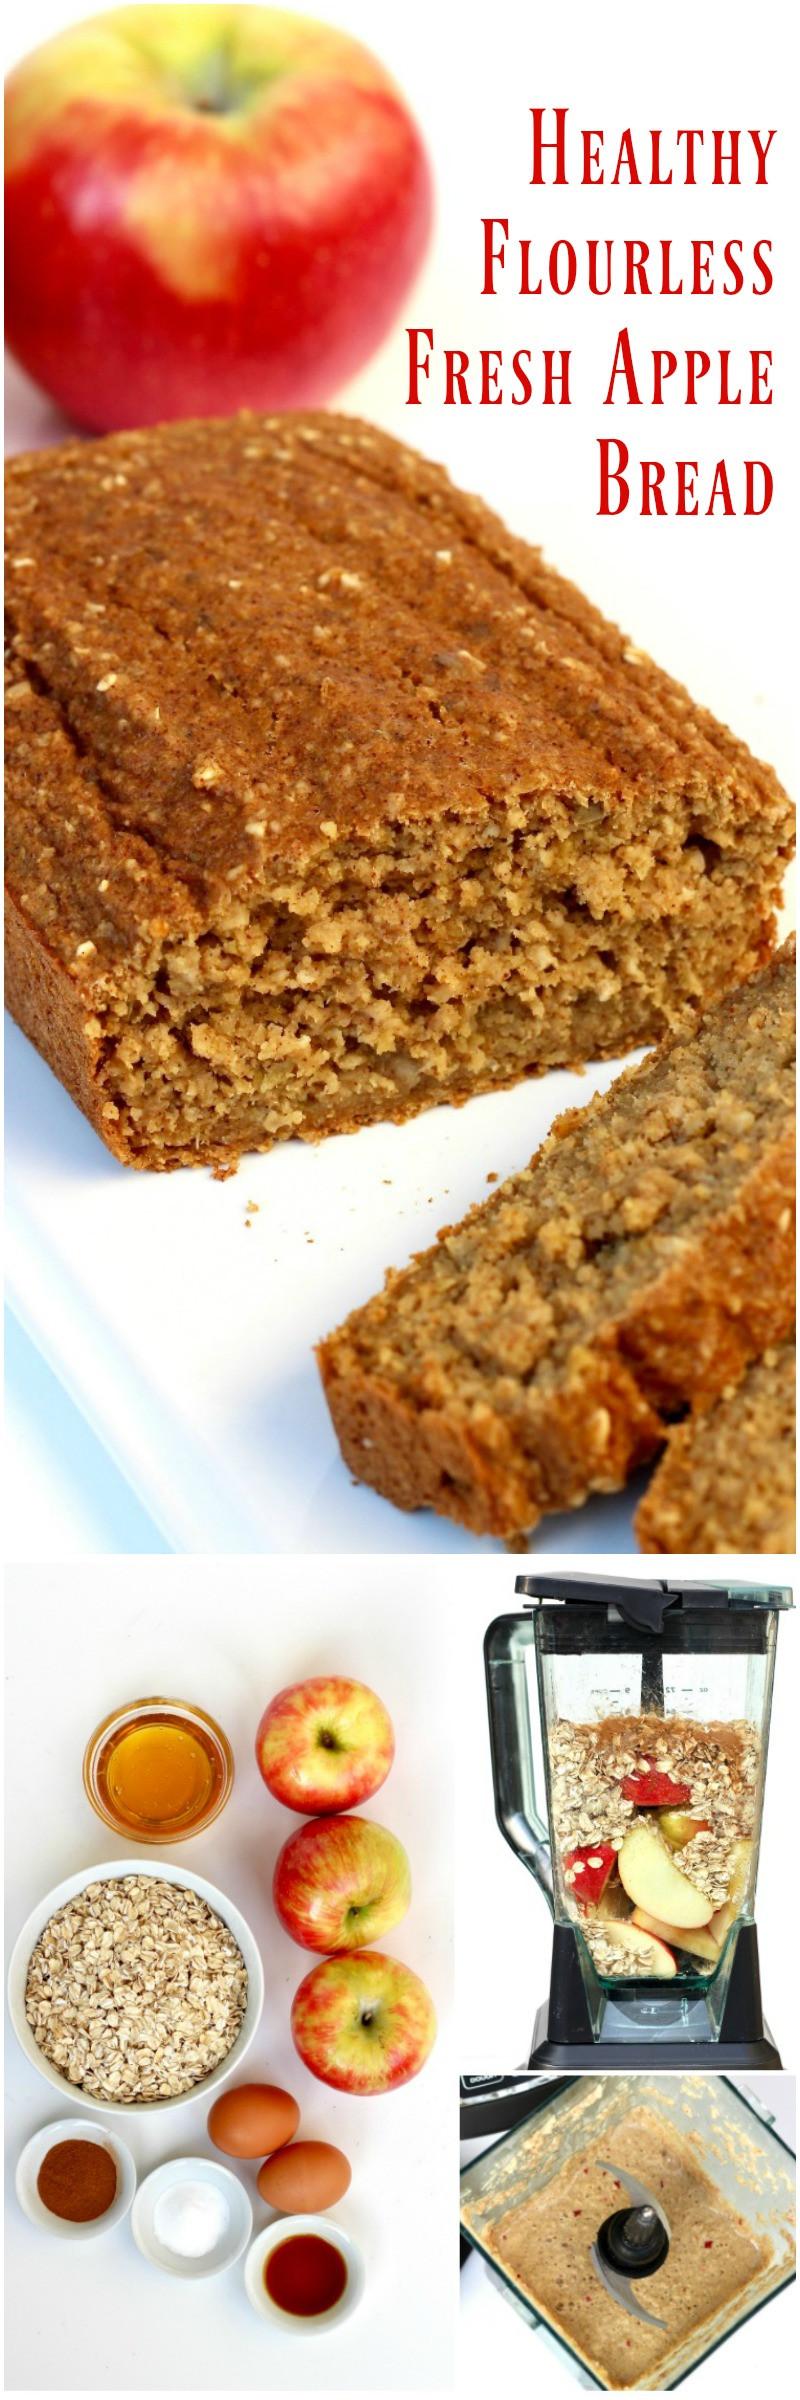 Healthy Apple Bread  Healthy Flourless Fresh Apple Bread recipequicks